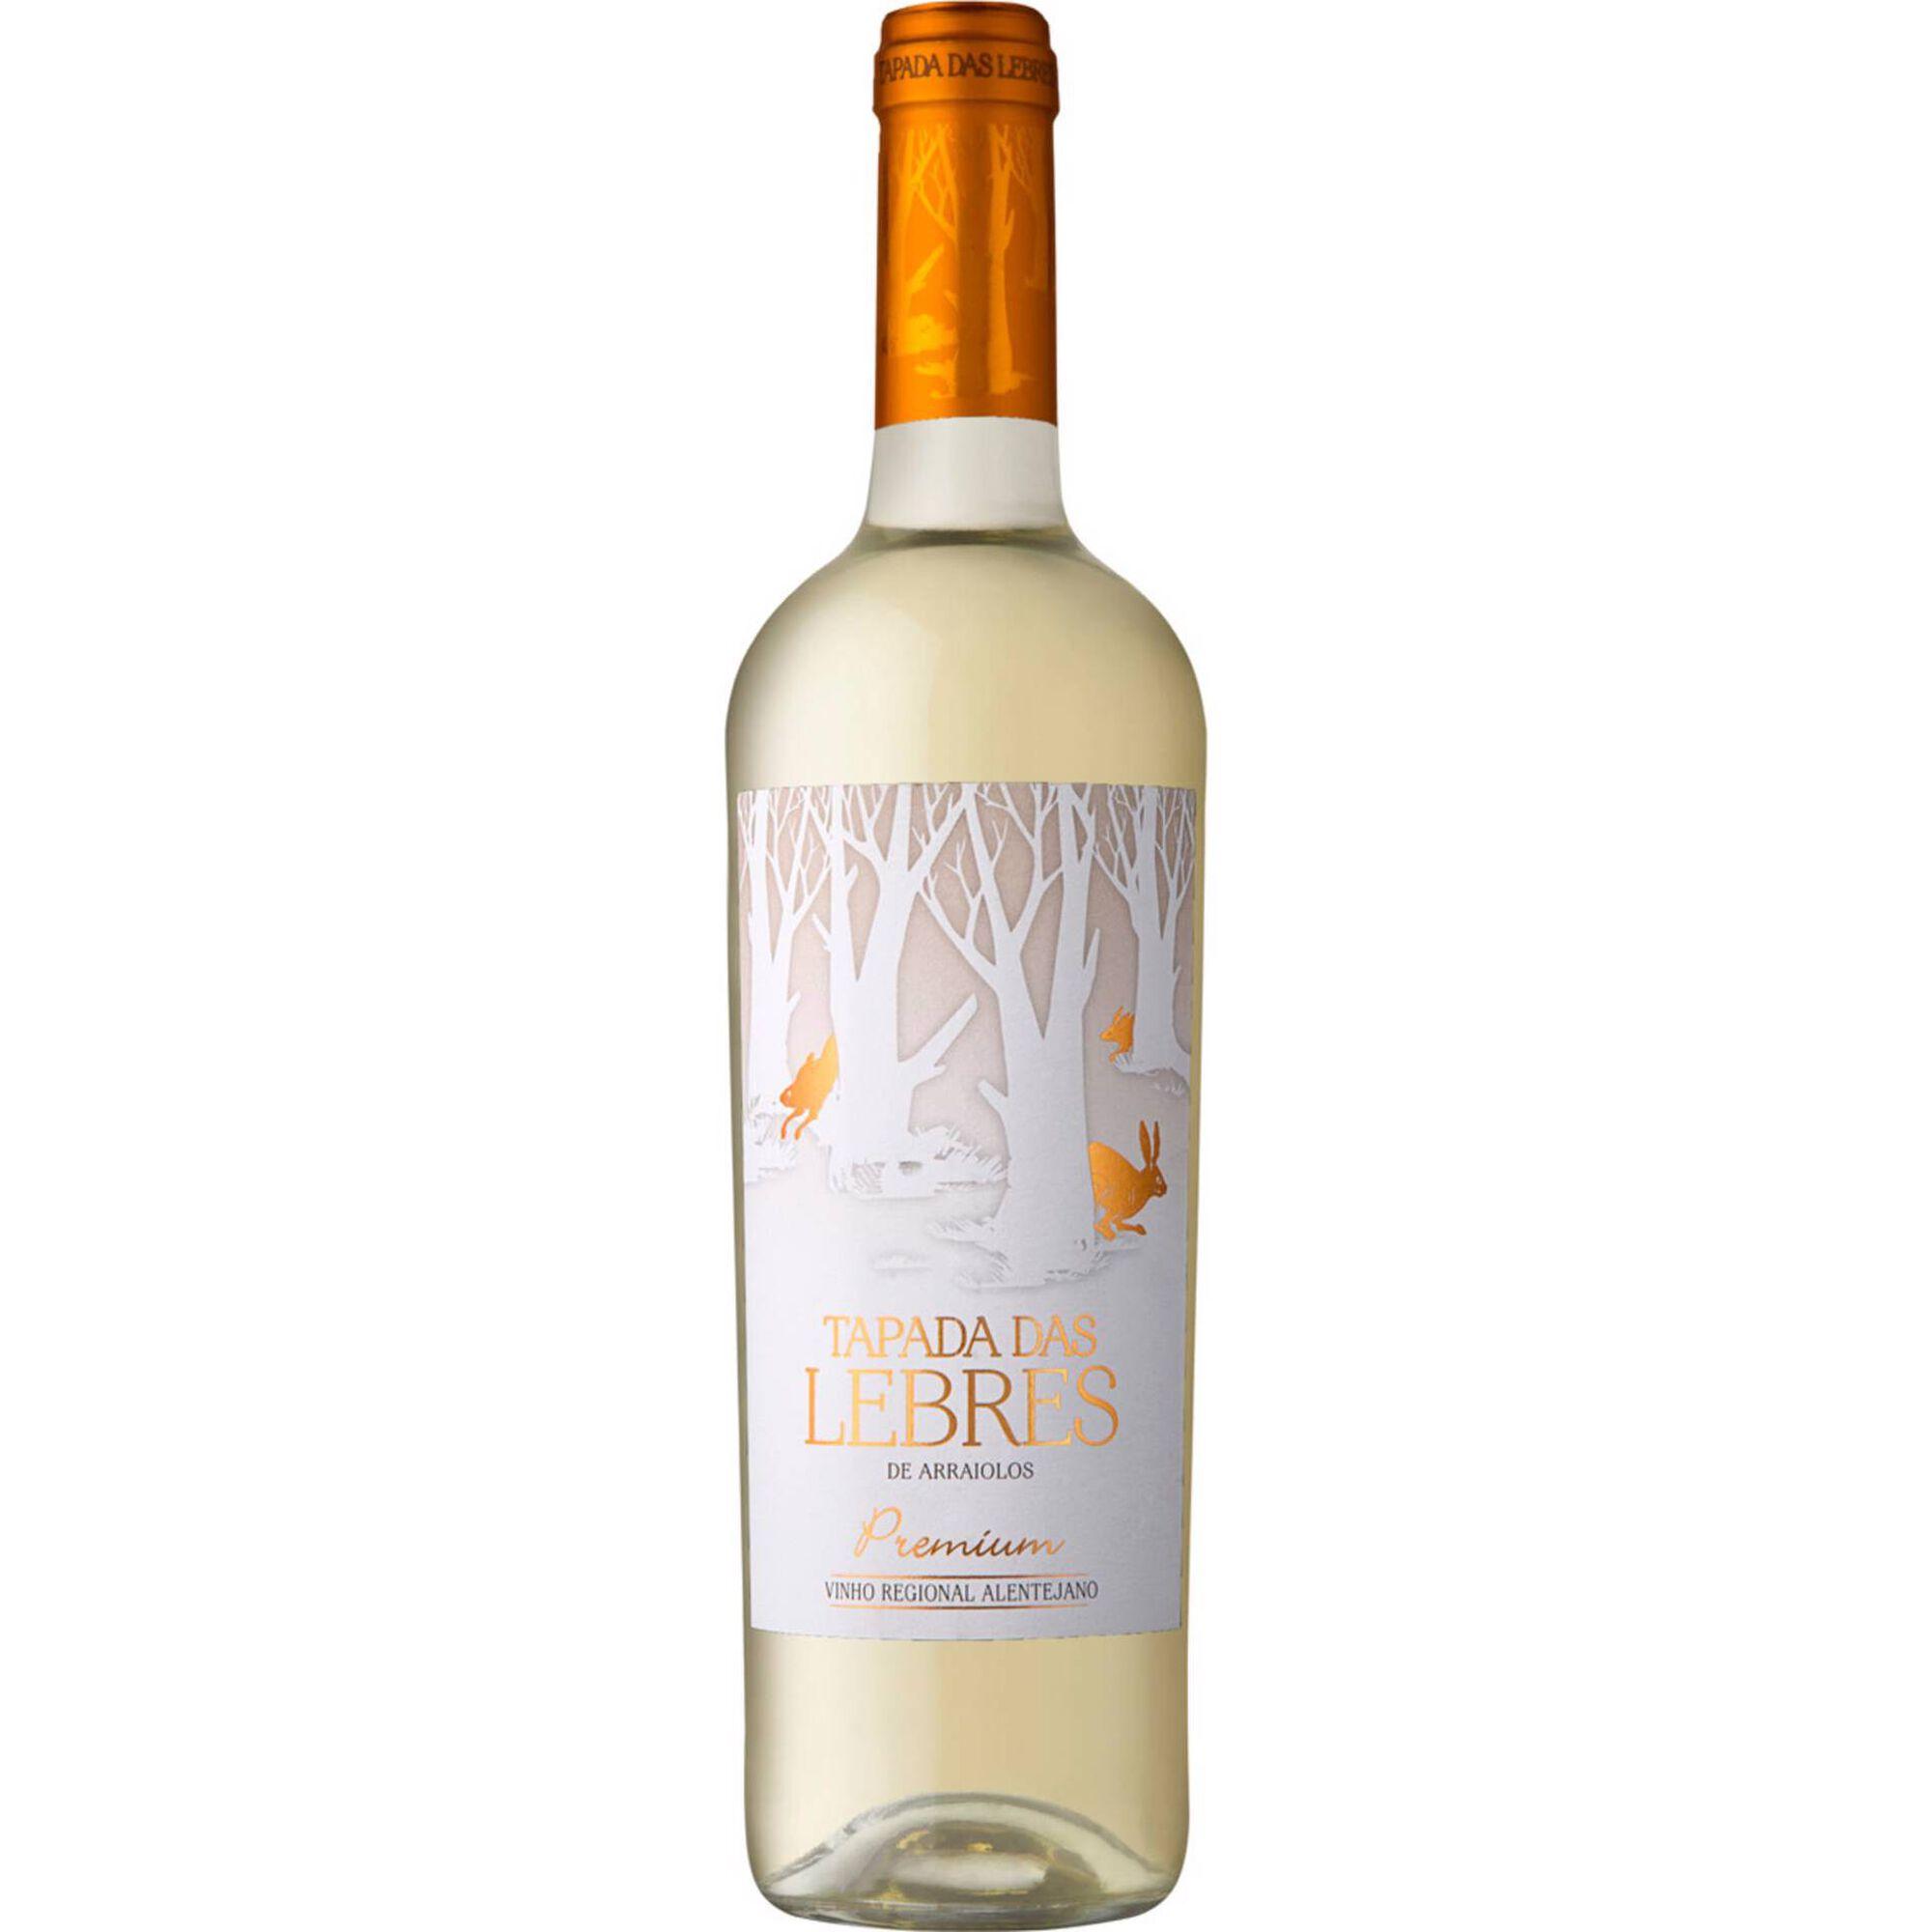 Tapada das Lebres Reserva Premium Regional Alentejano Vinho Branco